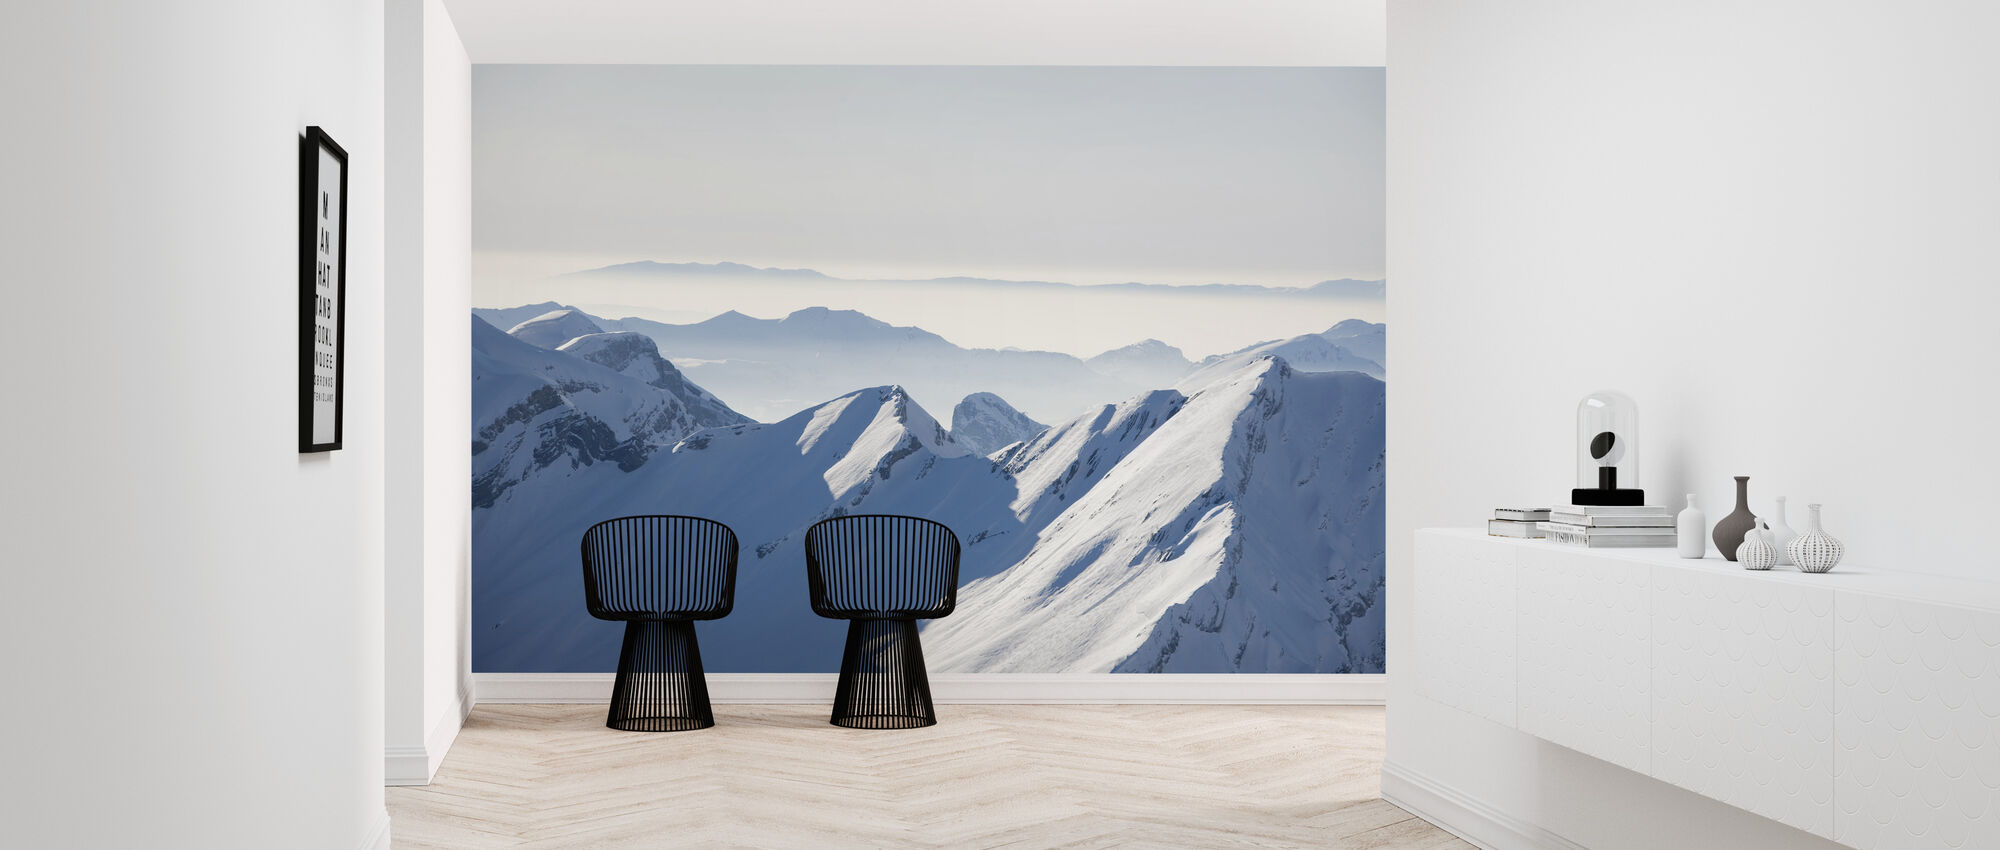 Chamonix Alps I, France - Wallpaper - Hallway